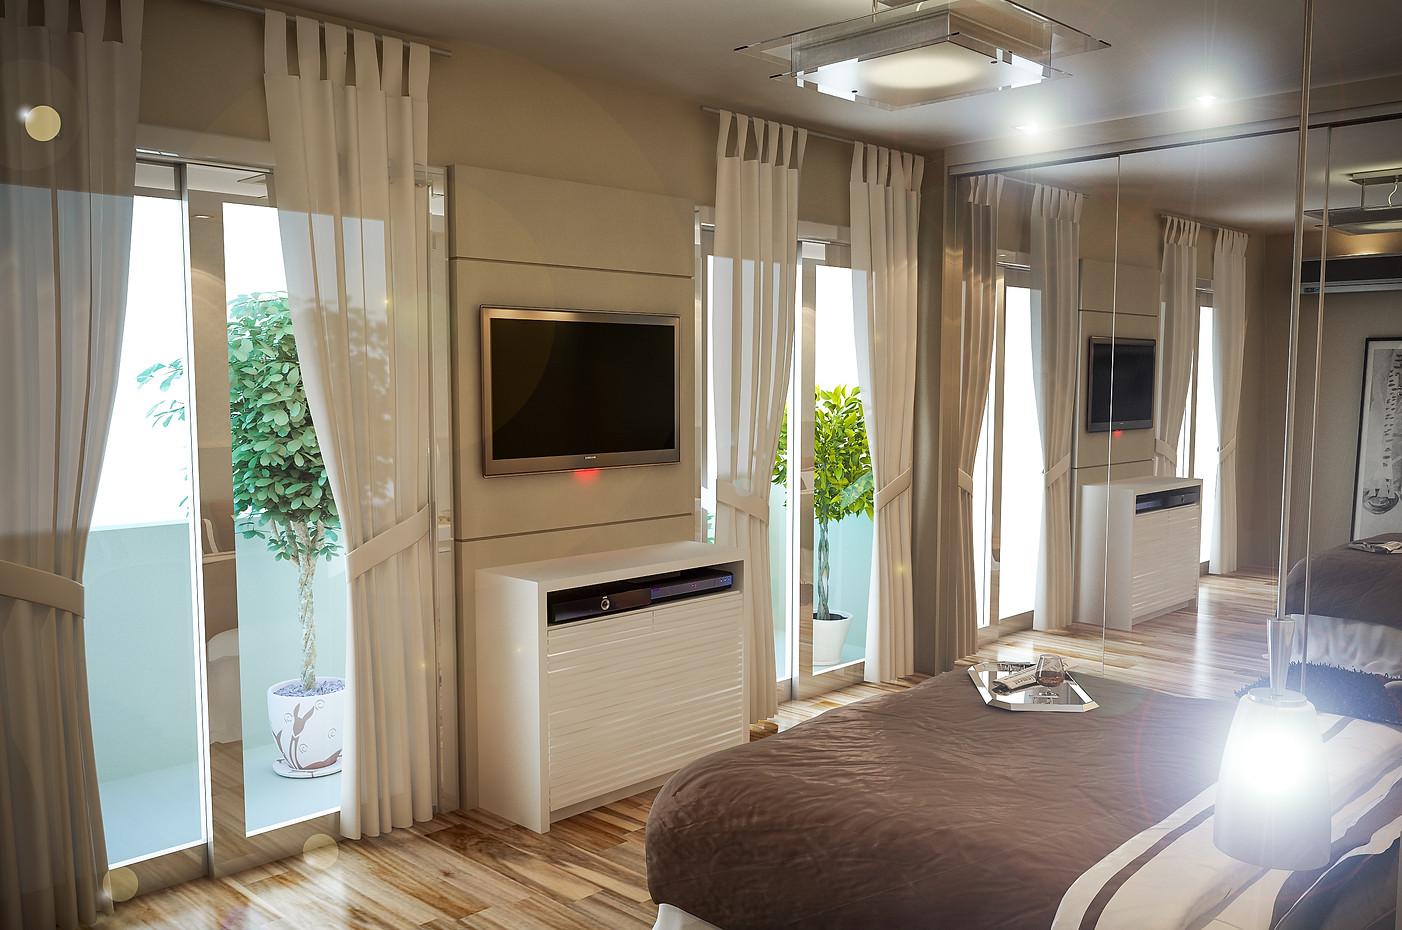 Dormitorio_Sob_Medida_Designinterno_10.j